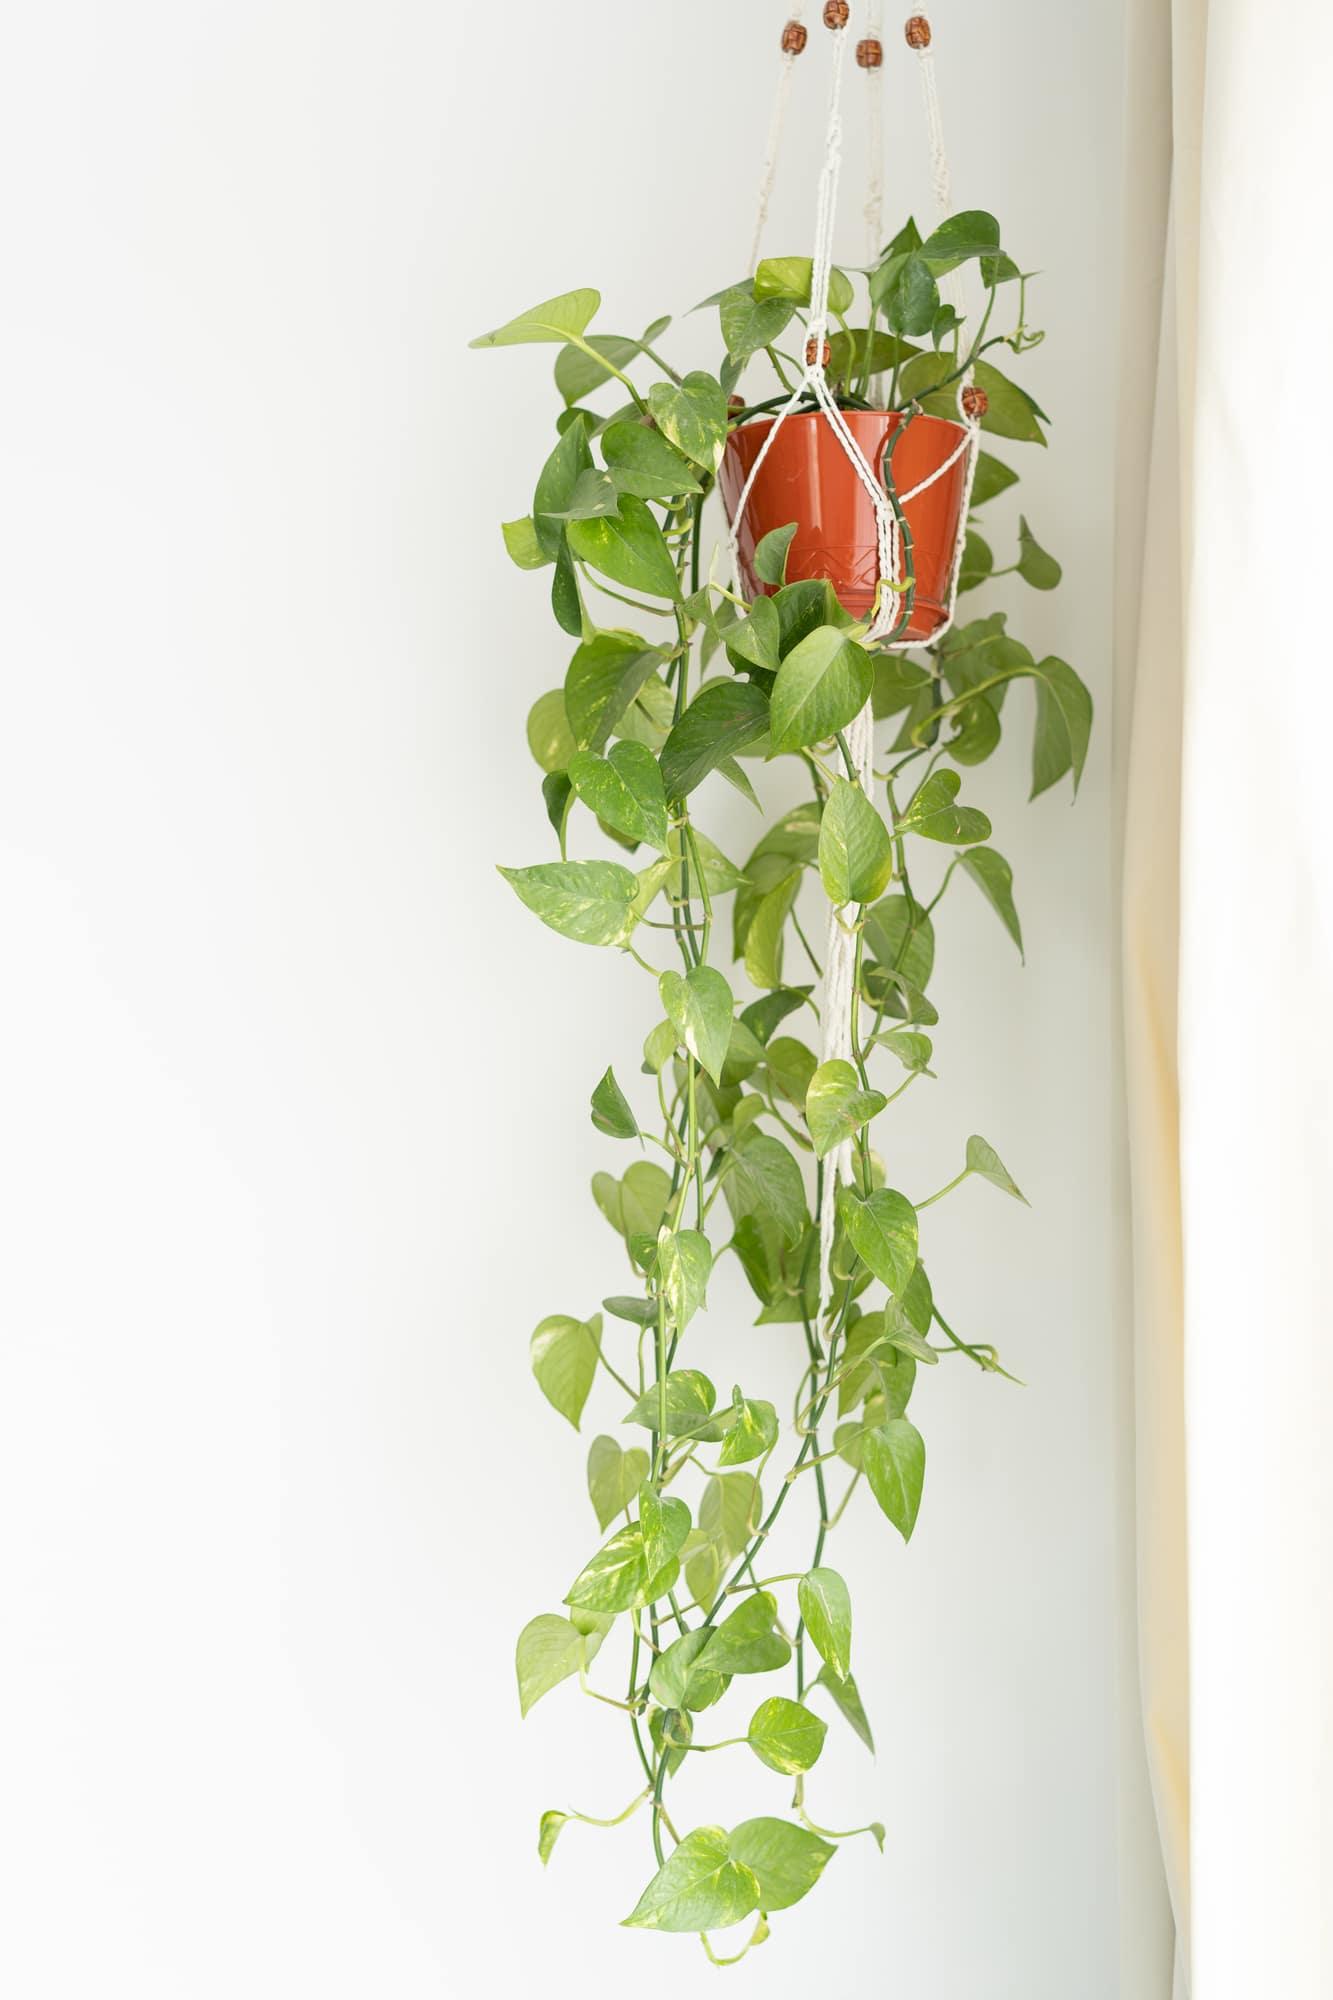 Plant Propagation How To Propagate A Pothos Plant Among The Lilacs